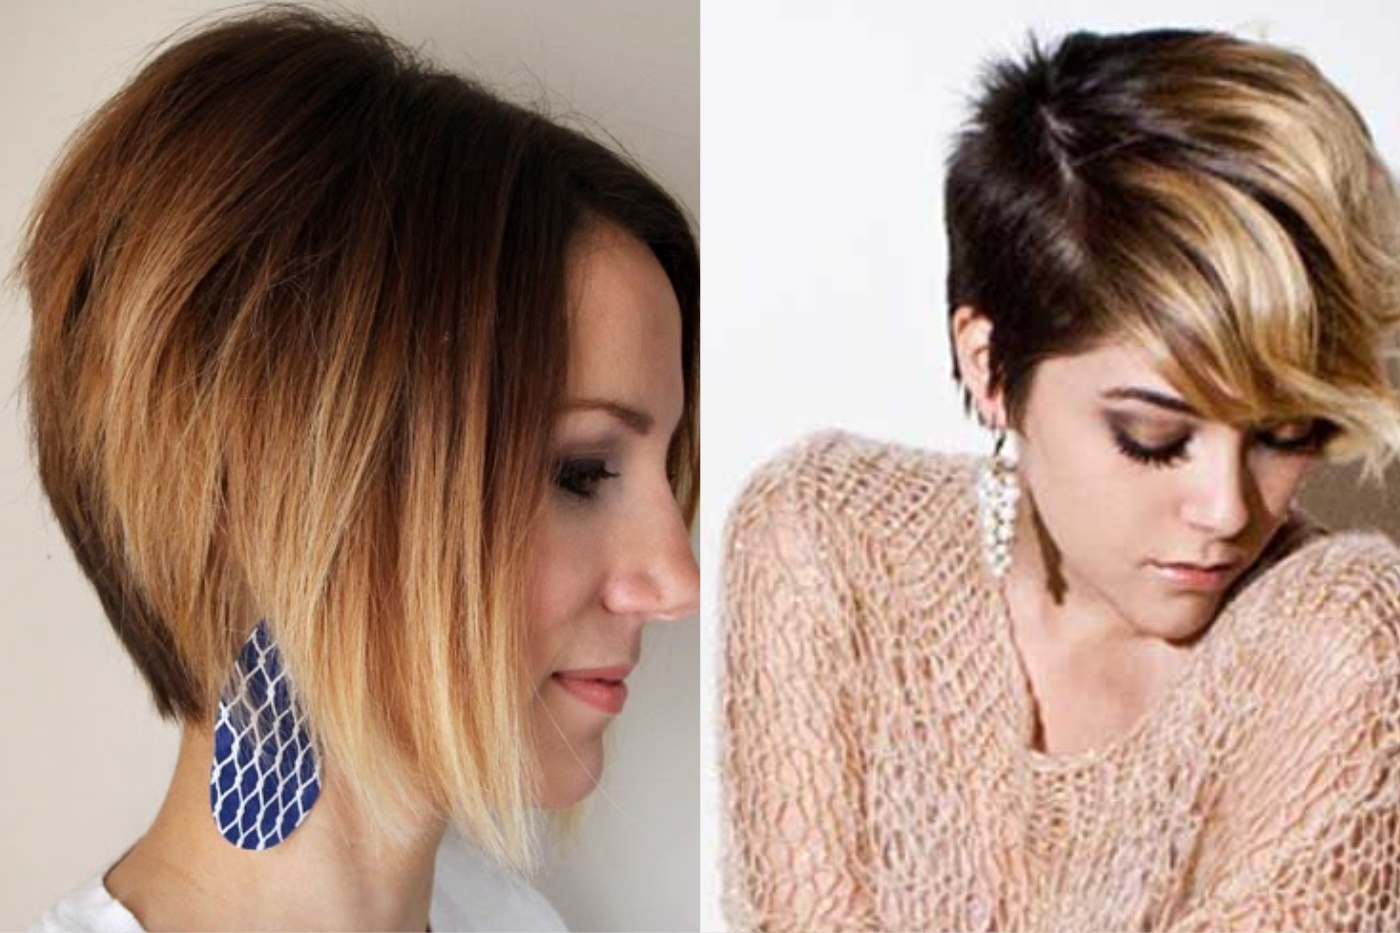 омбре наоборот на короткие волосы фото